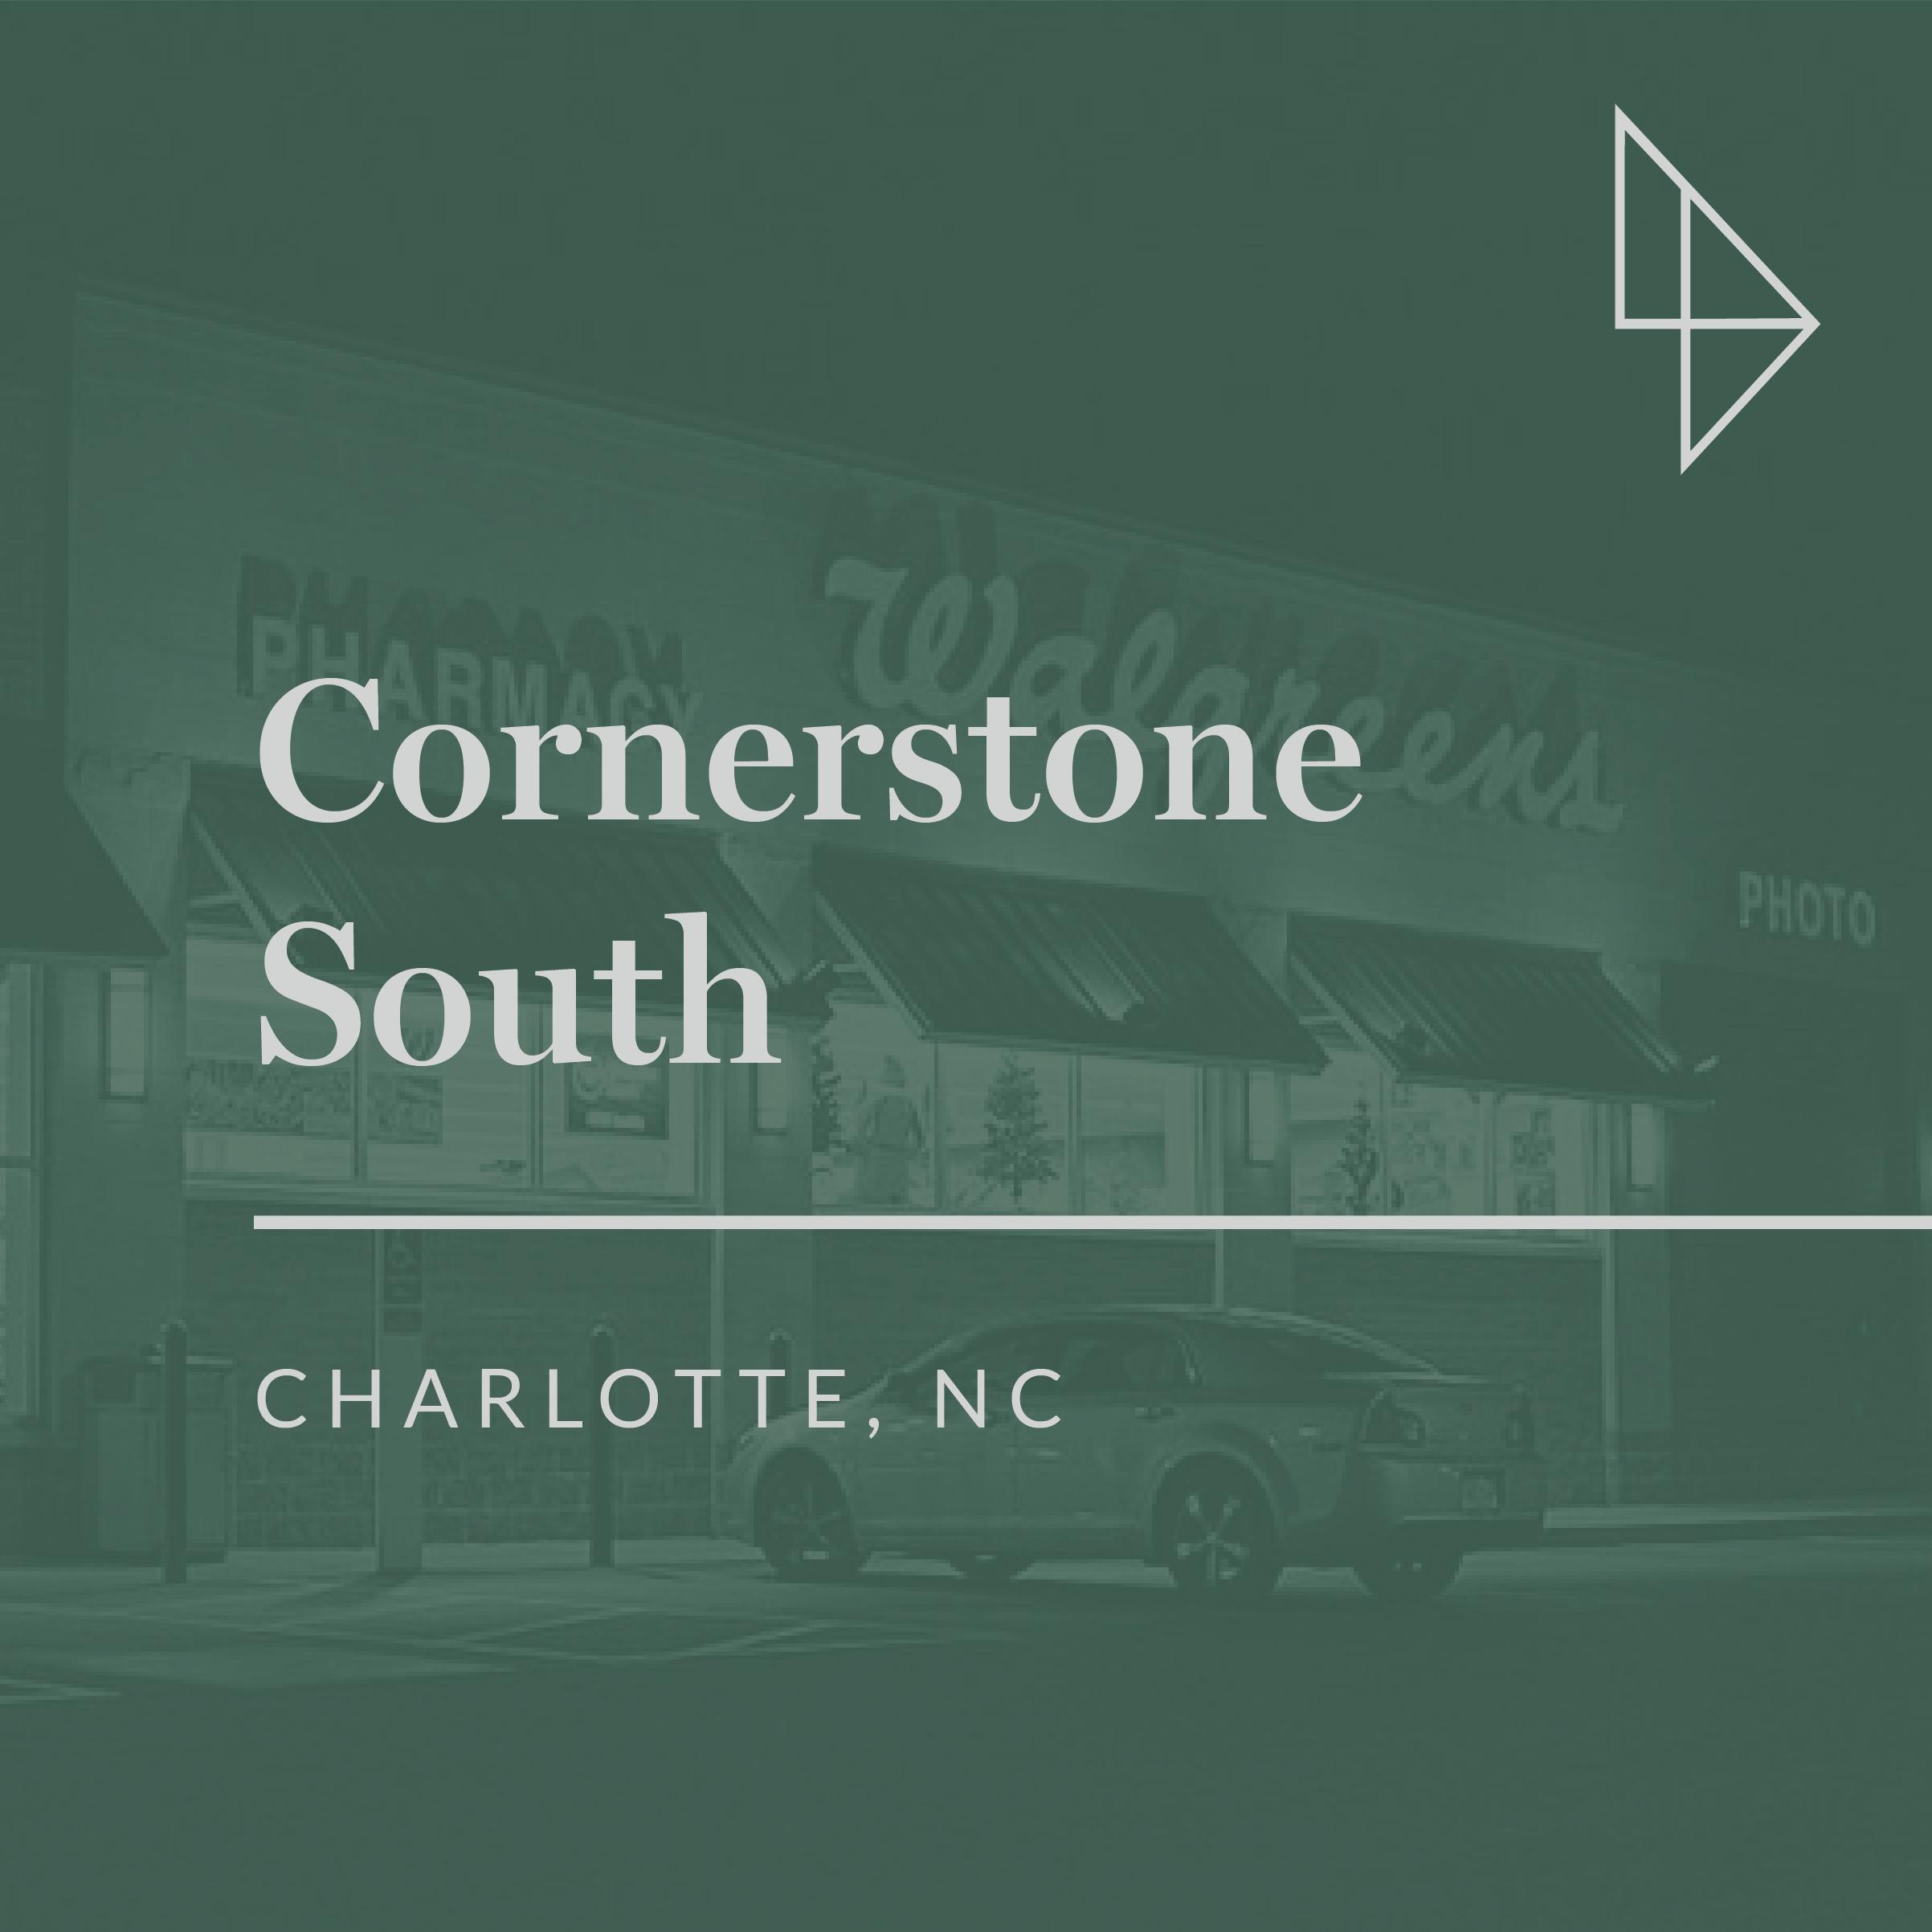 Cornerstone South